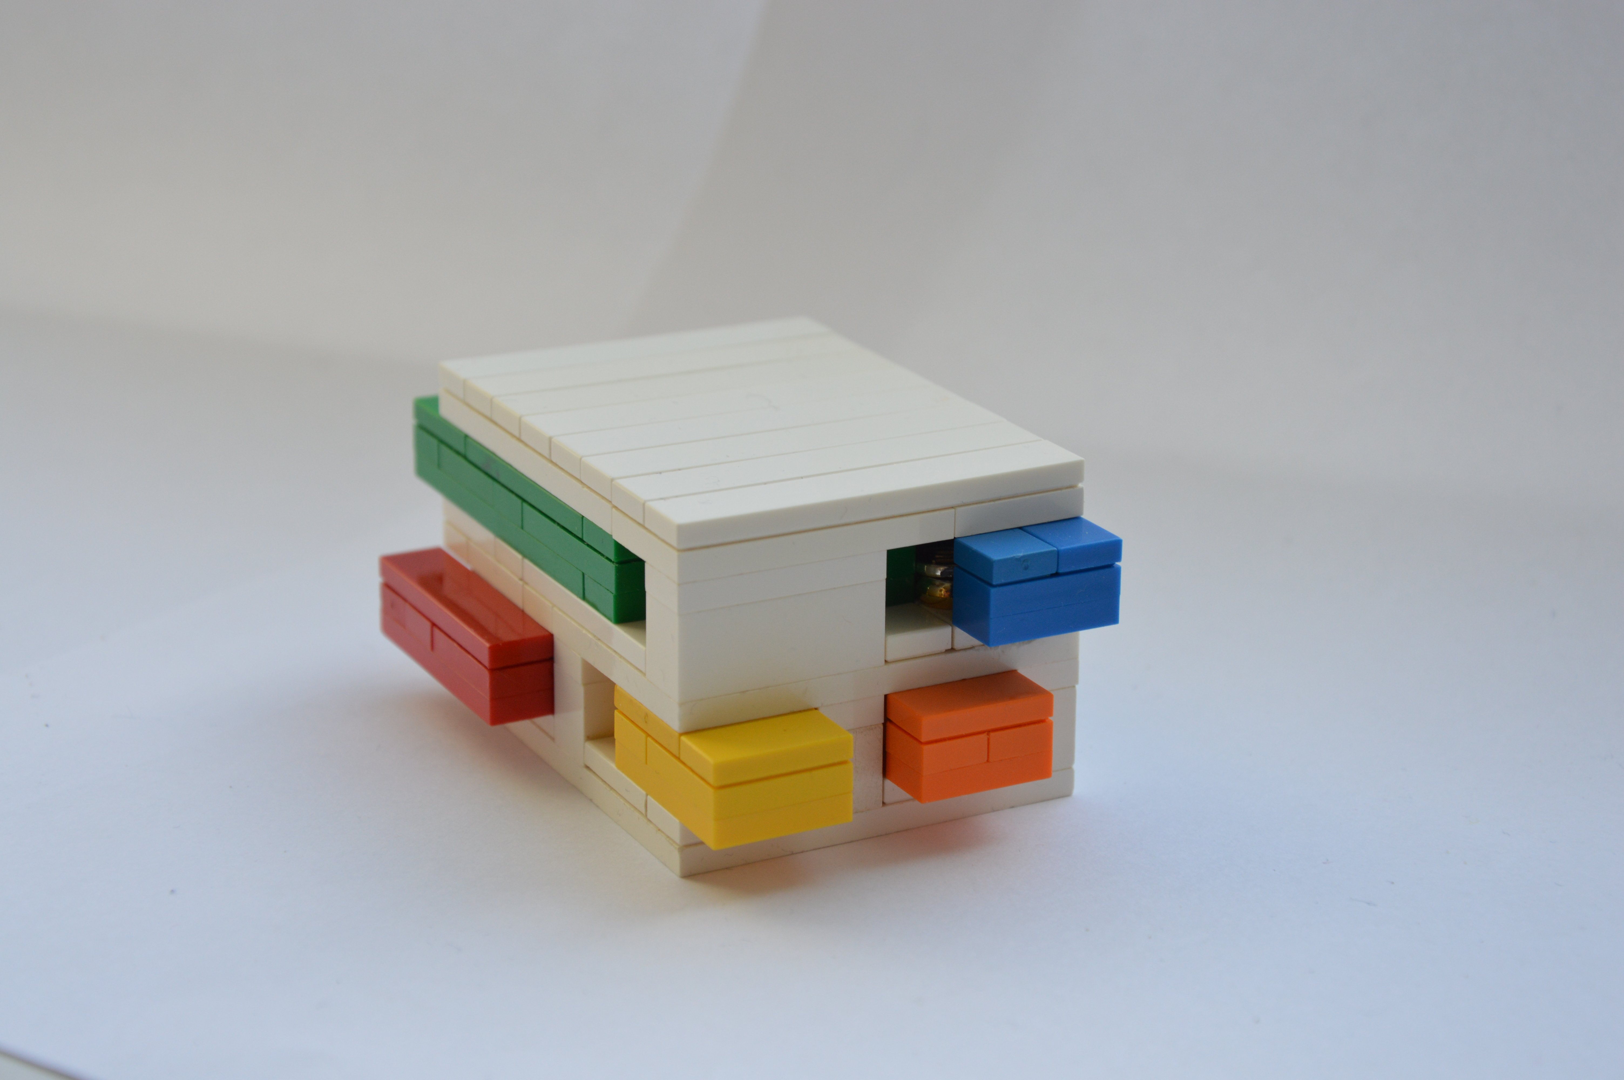 Lego Moc 3023 Lego Puzzle Box Technic 2015 Rebrickable Build